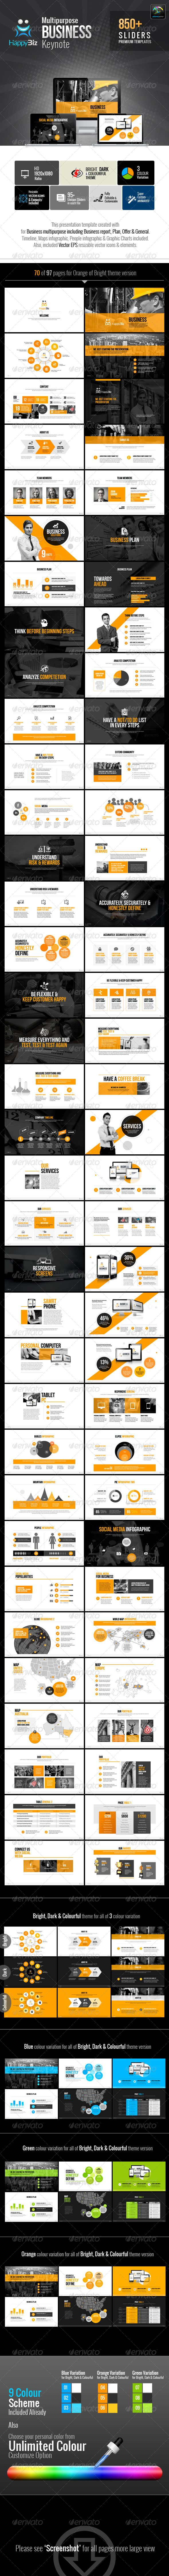 HappyBiz Multipurpose Keynote | Keynote theme / template